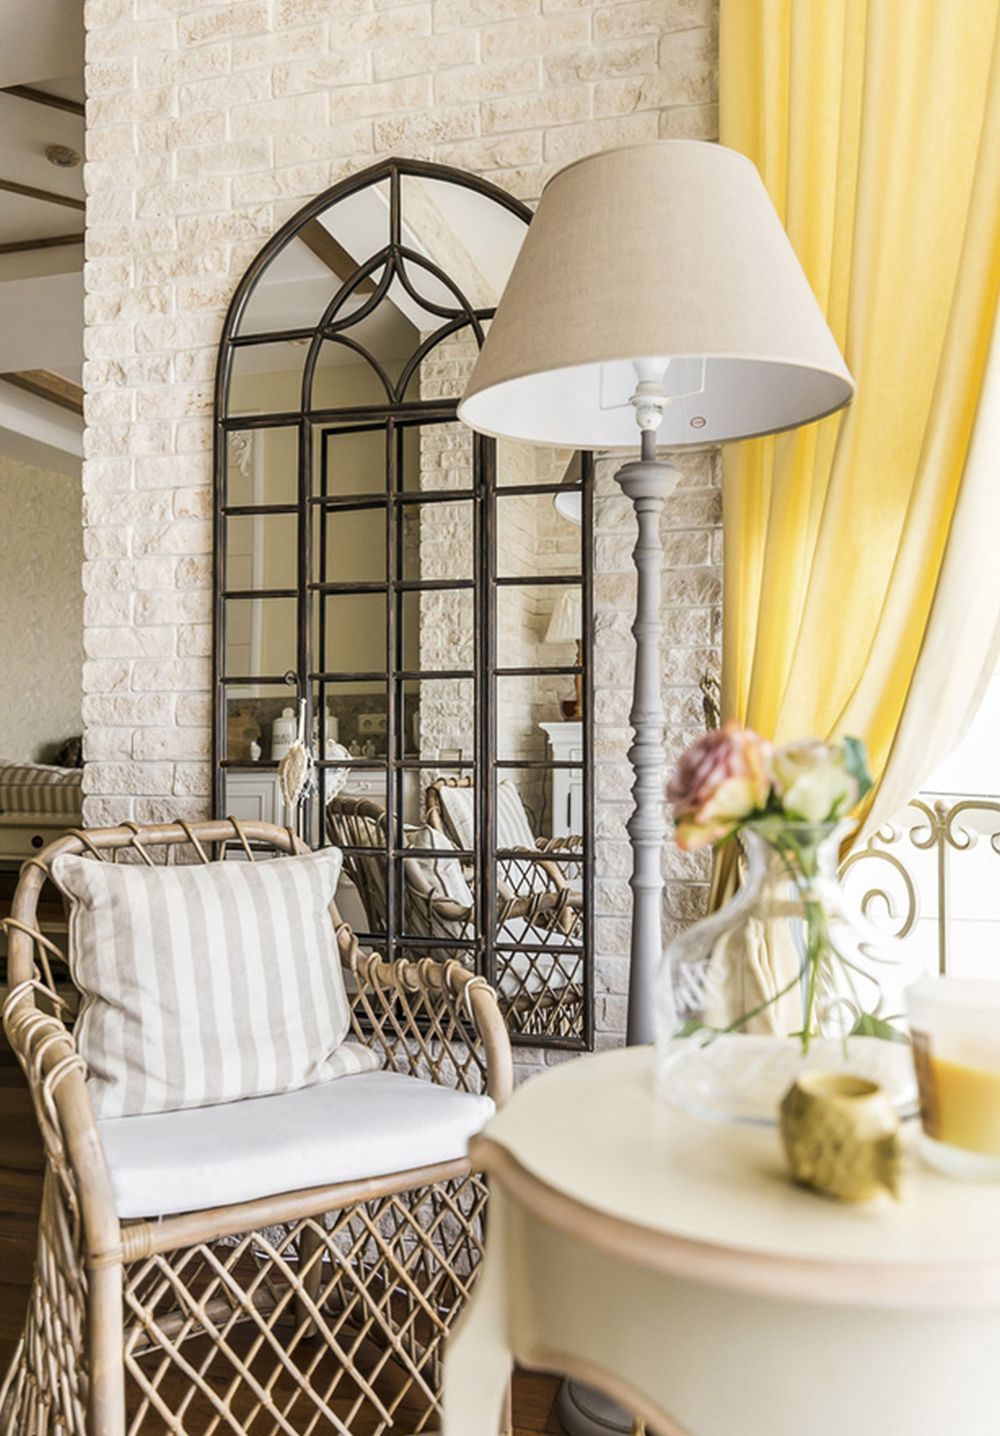 adelaparvucom despre apartament camere mp rusia designer svetlana yurkova design